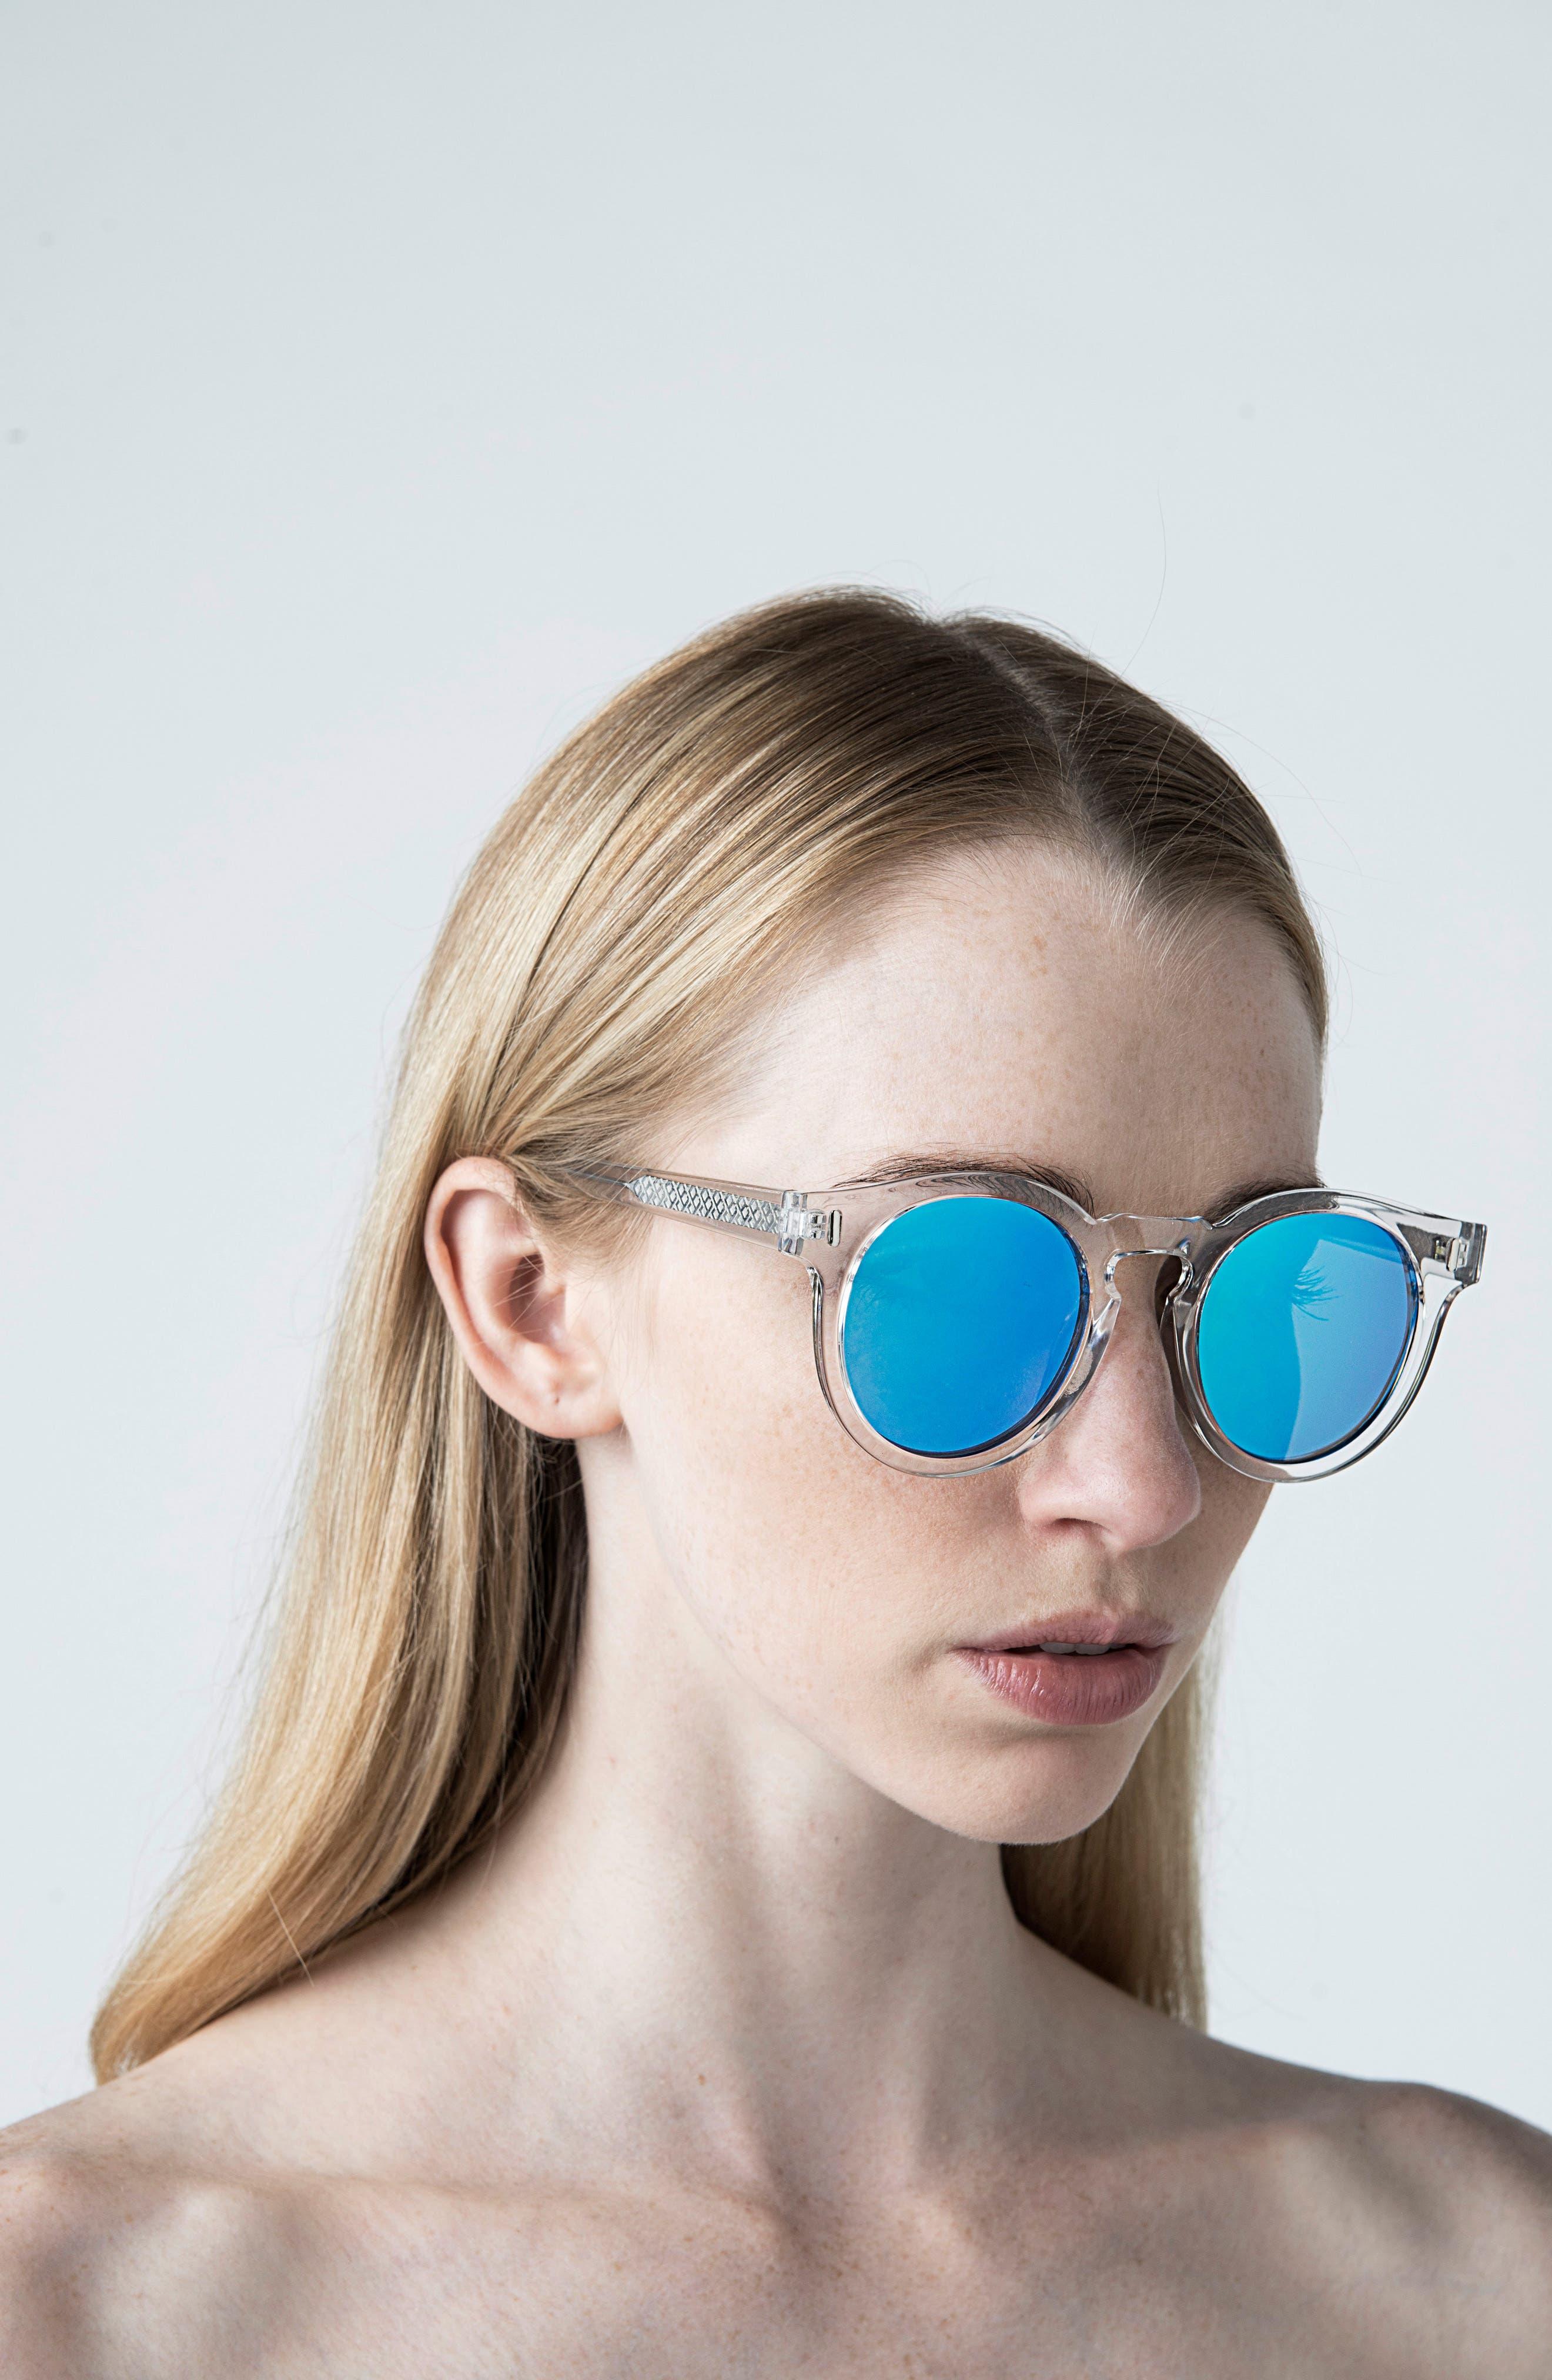 Hill 50mm Polarized Sunglasses,                             Alternate thumbnail 2, color,                             Ocean Eyes Blue